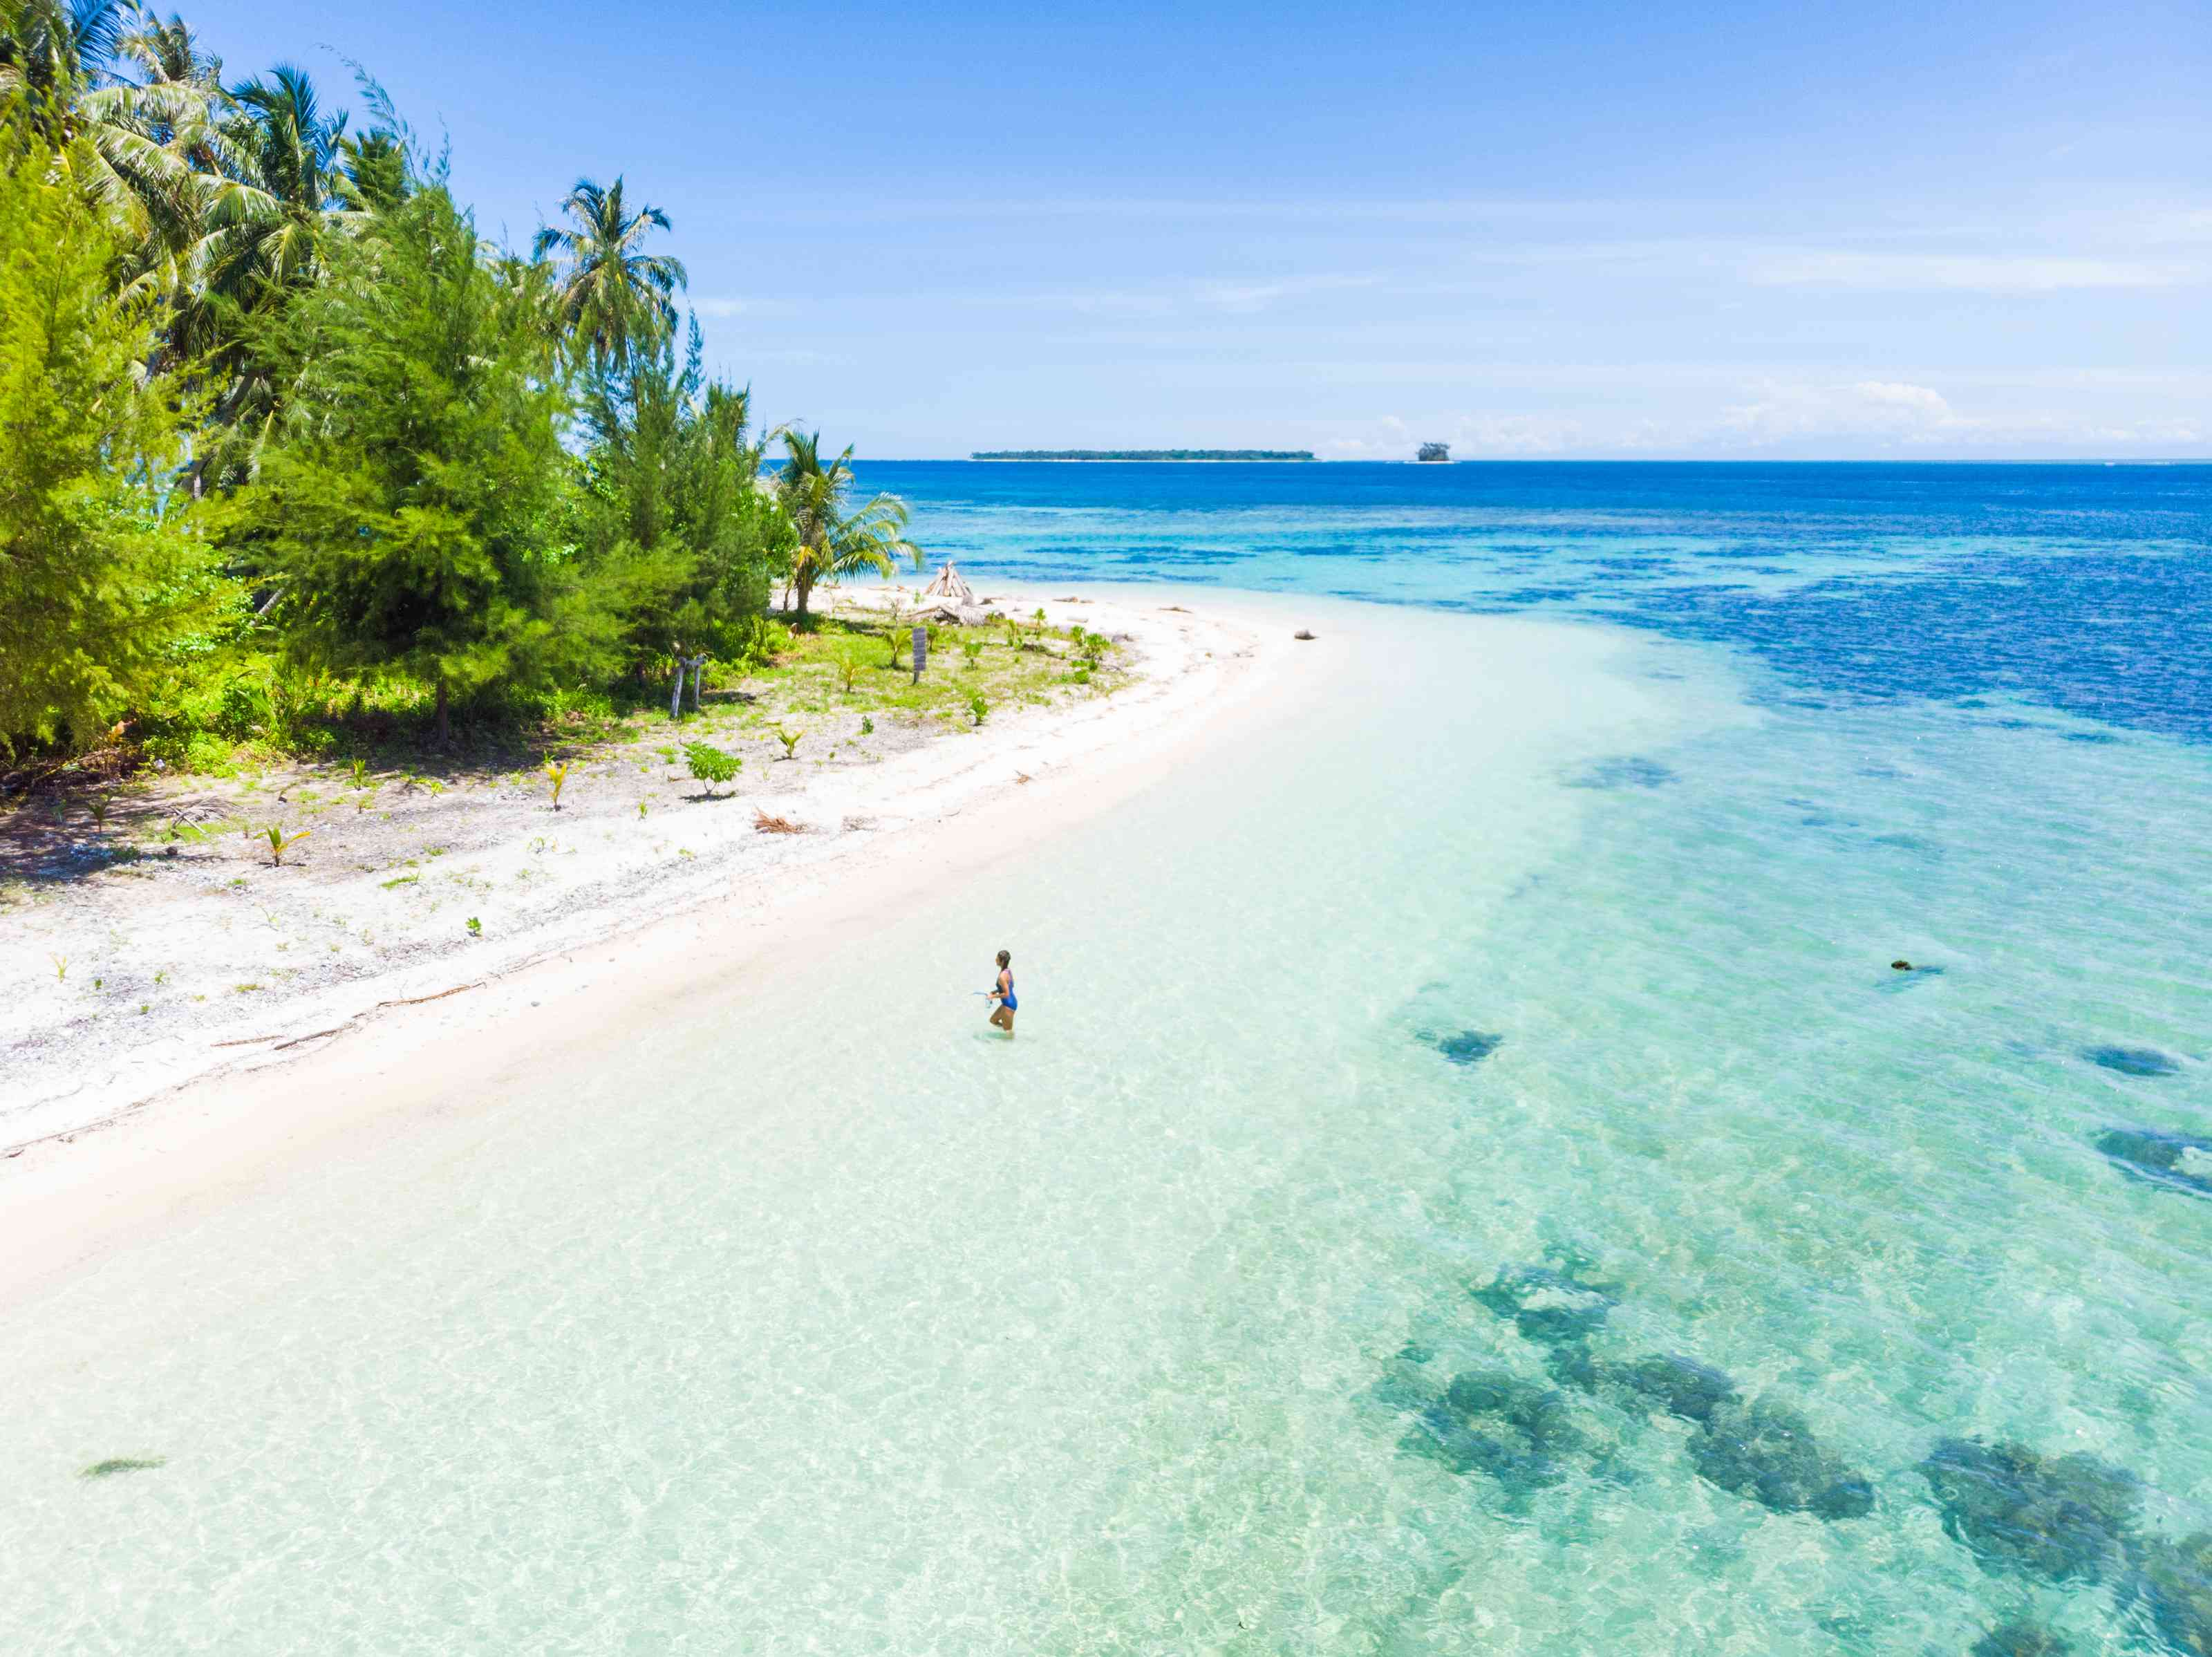 Banyak Islands, Aceh, Indonesia